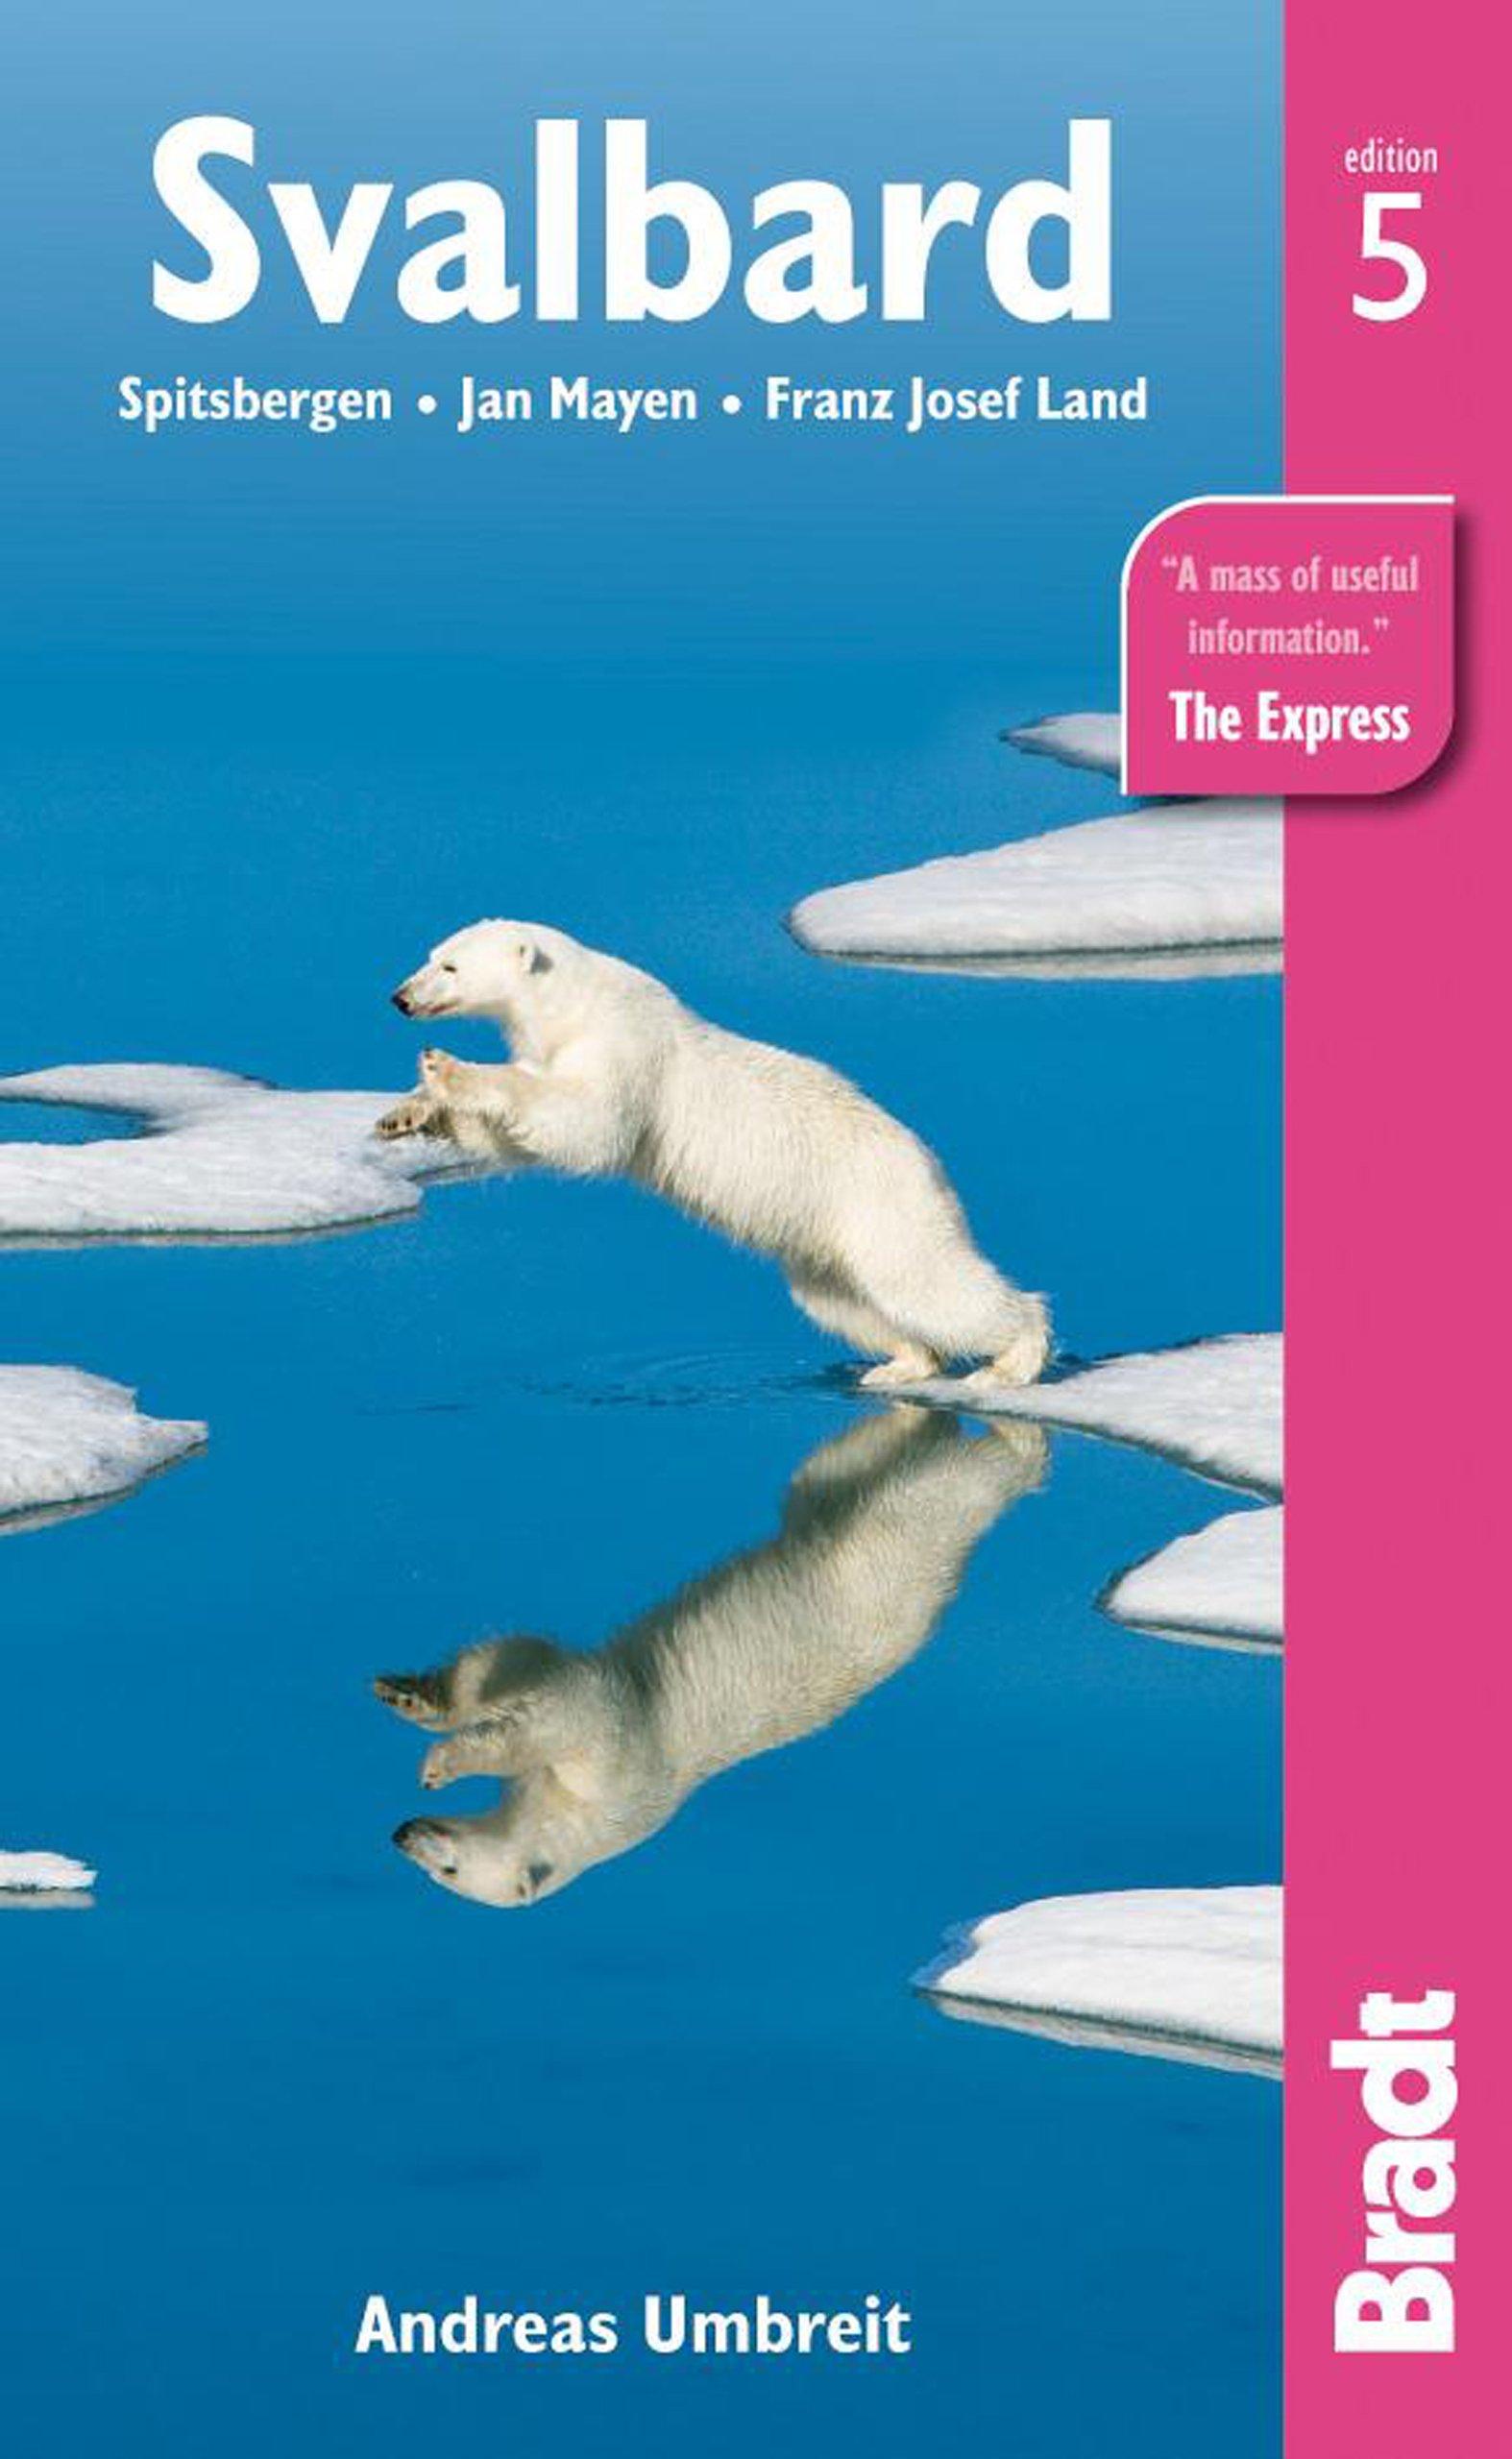 Svalbard, 5th: Spitzbergen, Jan Mayen, Frank Josef Land (Bradt Travel Guides) ebook